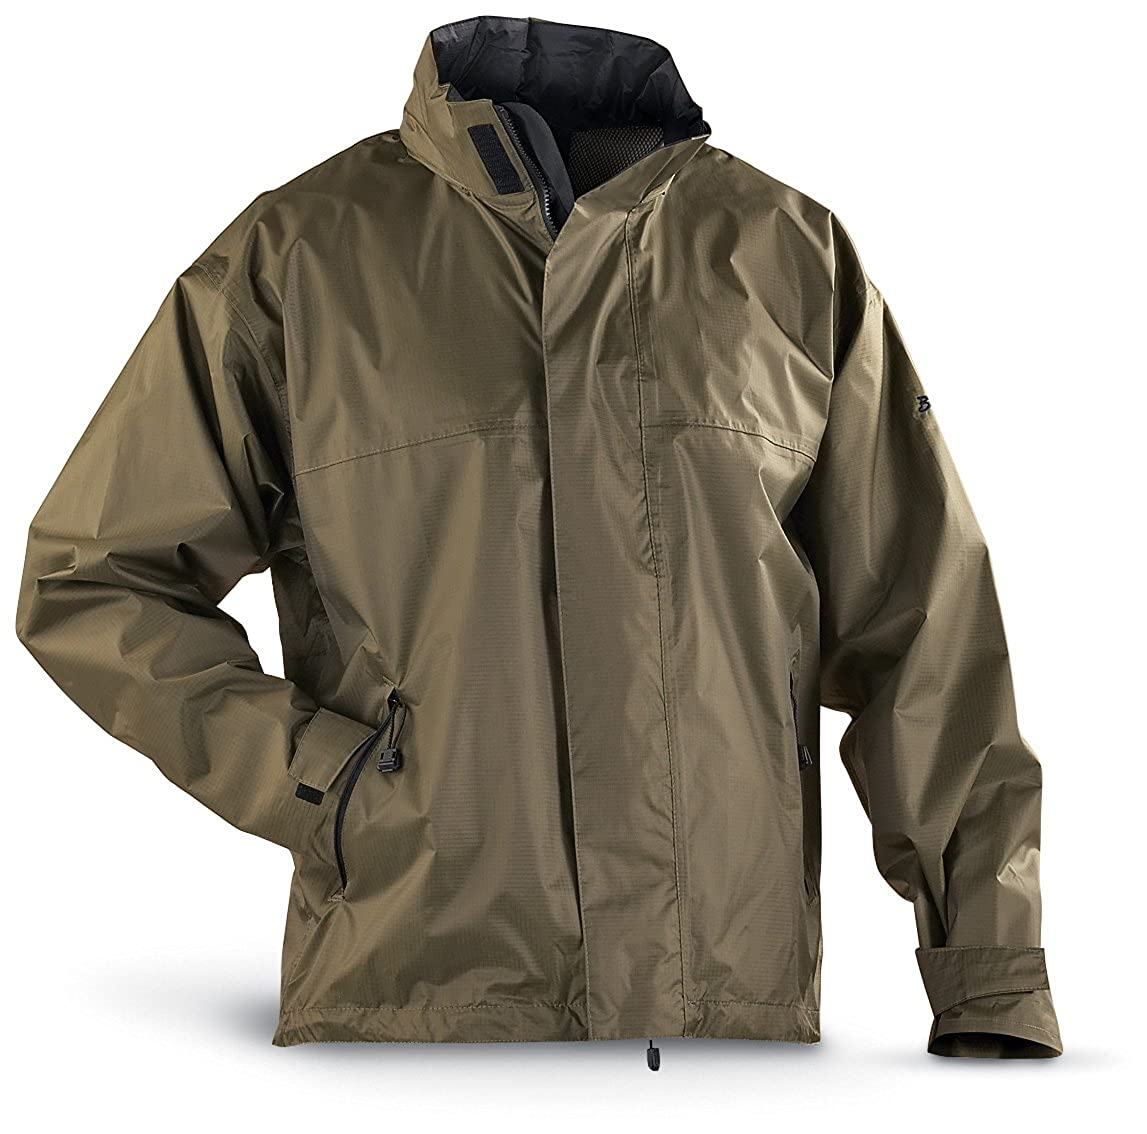 3f4293cd84 The North Face Afton Rain Jacket Men s Burnt Olive Green … Bimini Bay  Outfitters Men s Boca Grande Waterproof Jacket at Amazon Men s Clothing  store